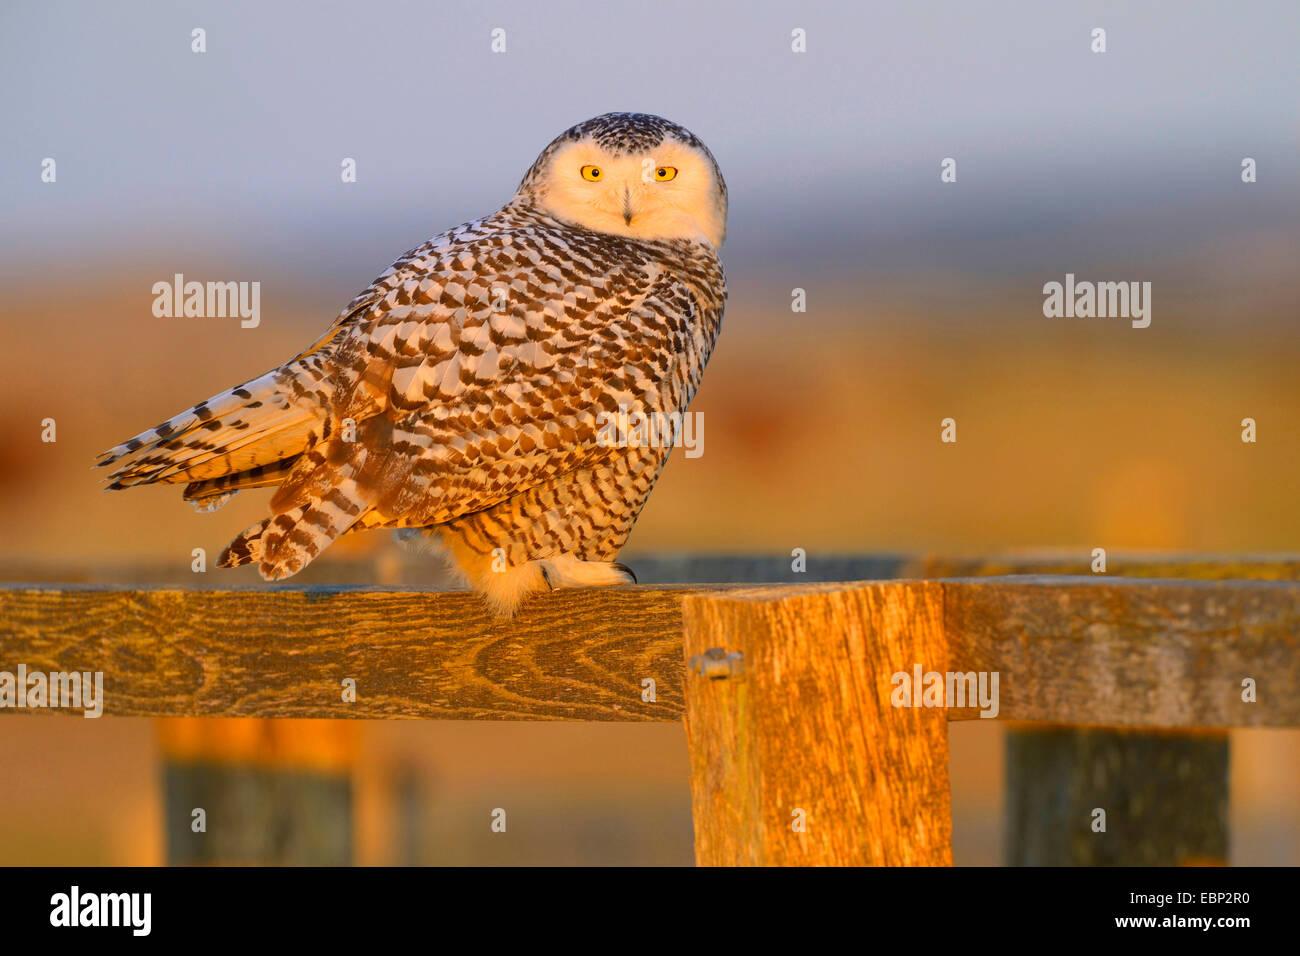 Snowy Owl (Strix scandiaca, Nyctea scandiaca, Bubo scandiacus), female resting on a wooden fence in evening light, - Stock Image